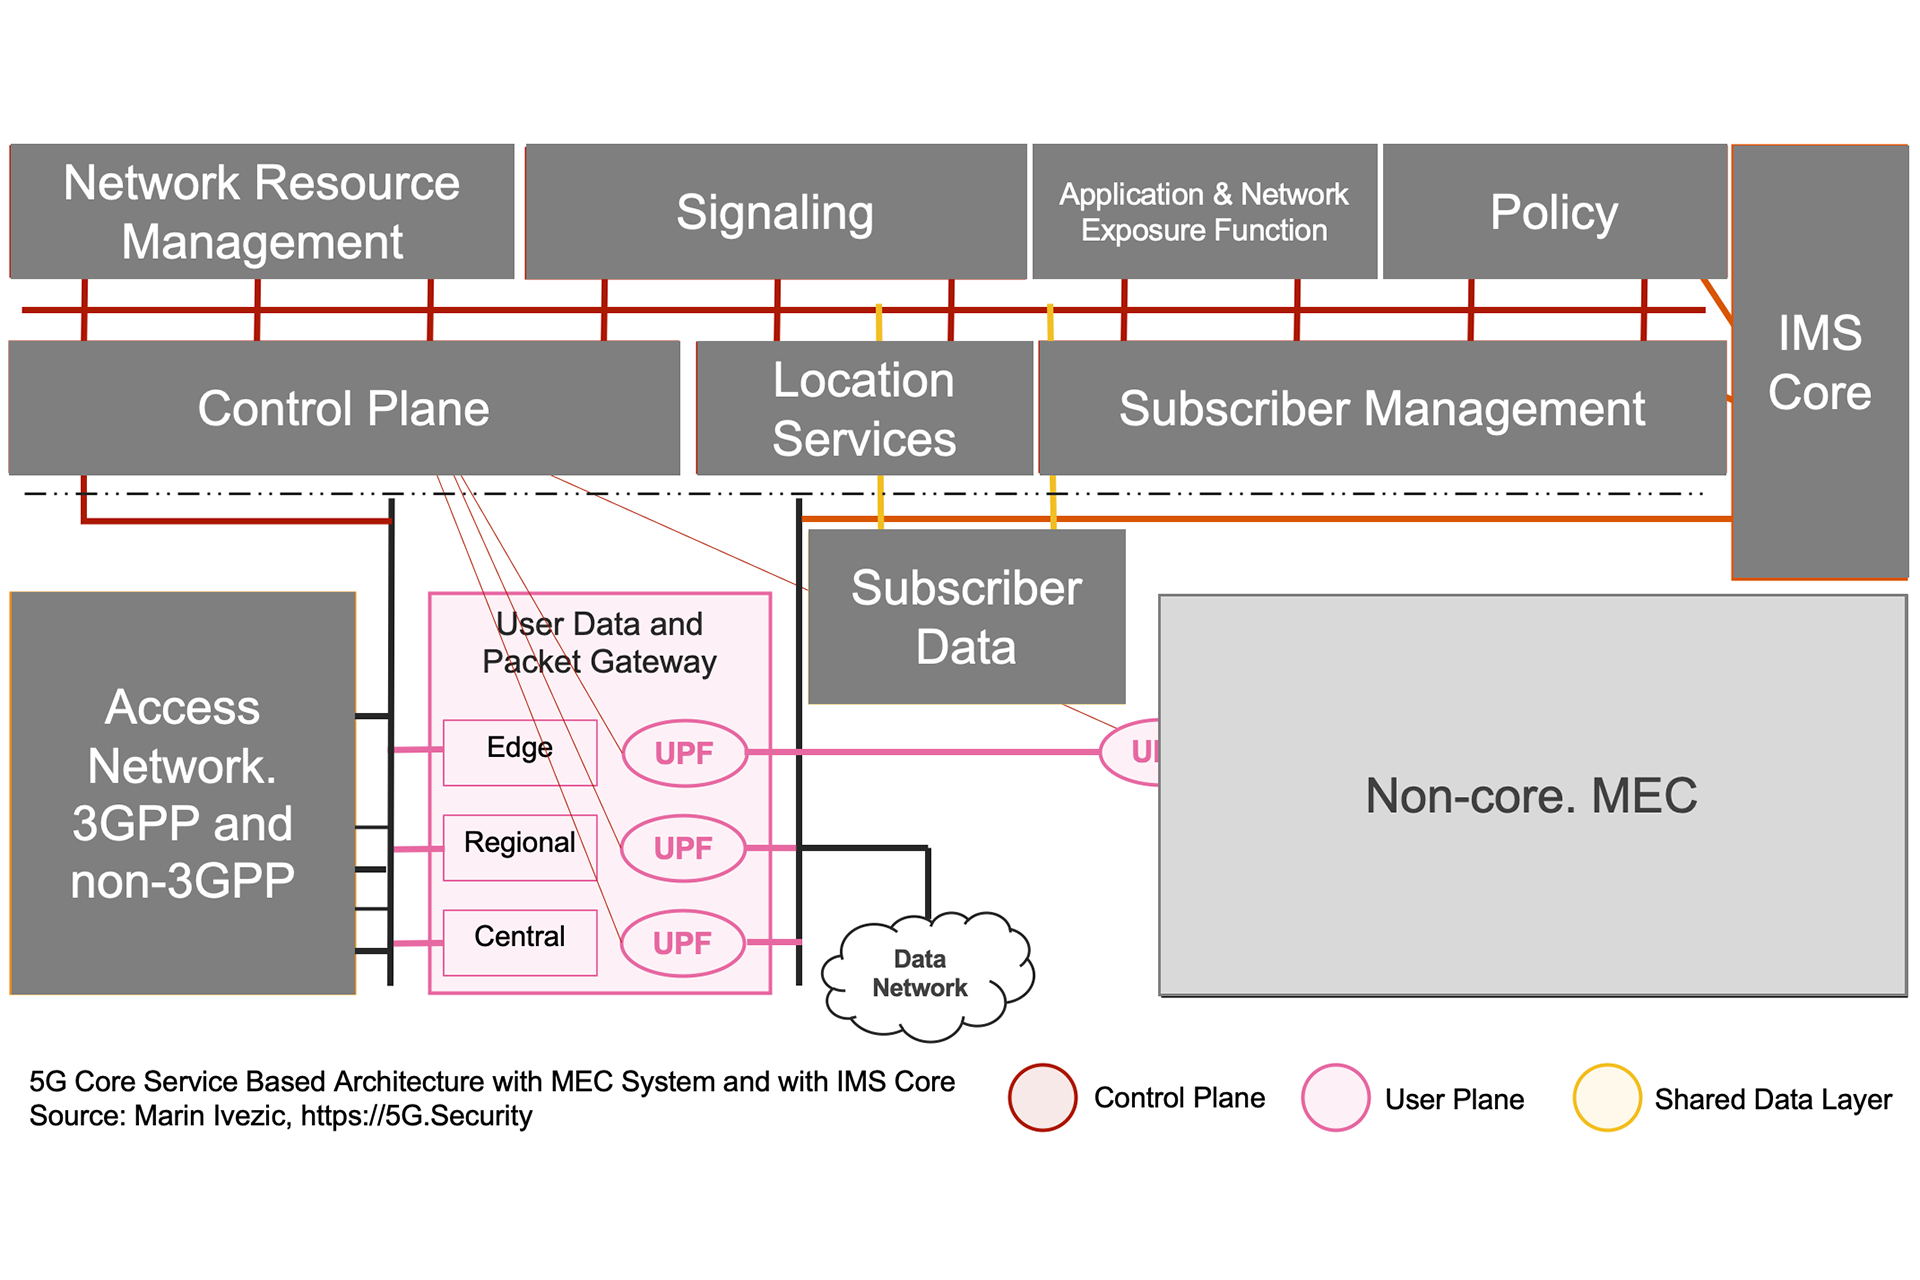 5G SBA IMS MEC Architecture - User Plane